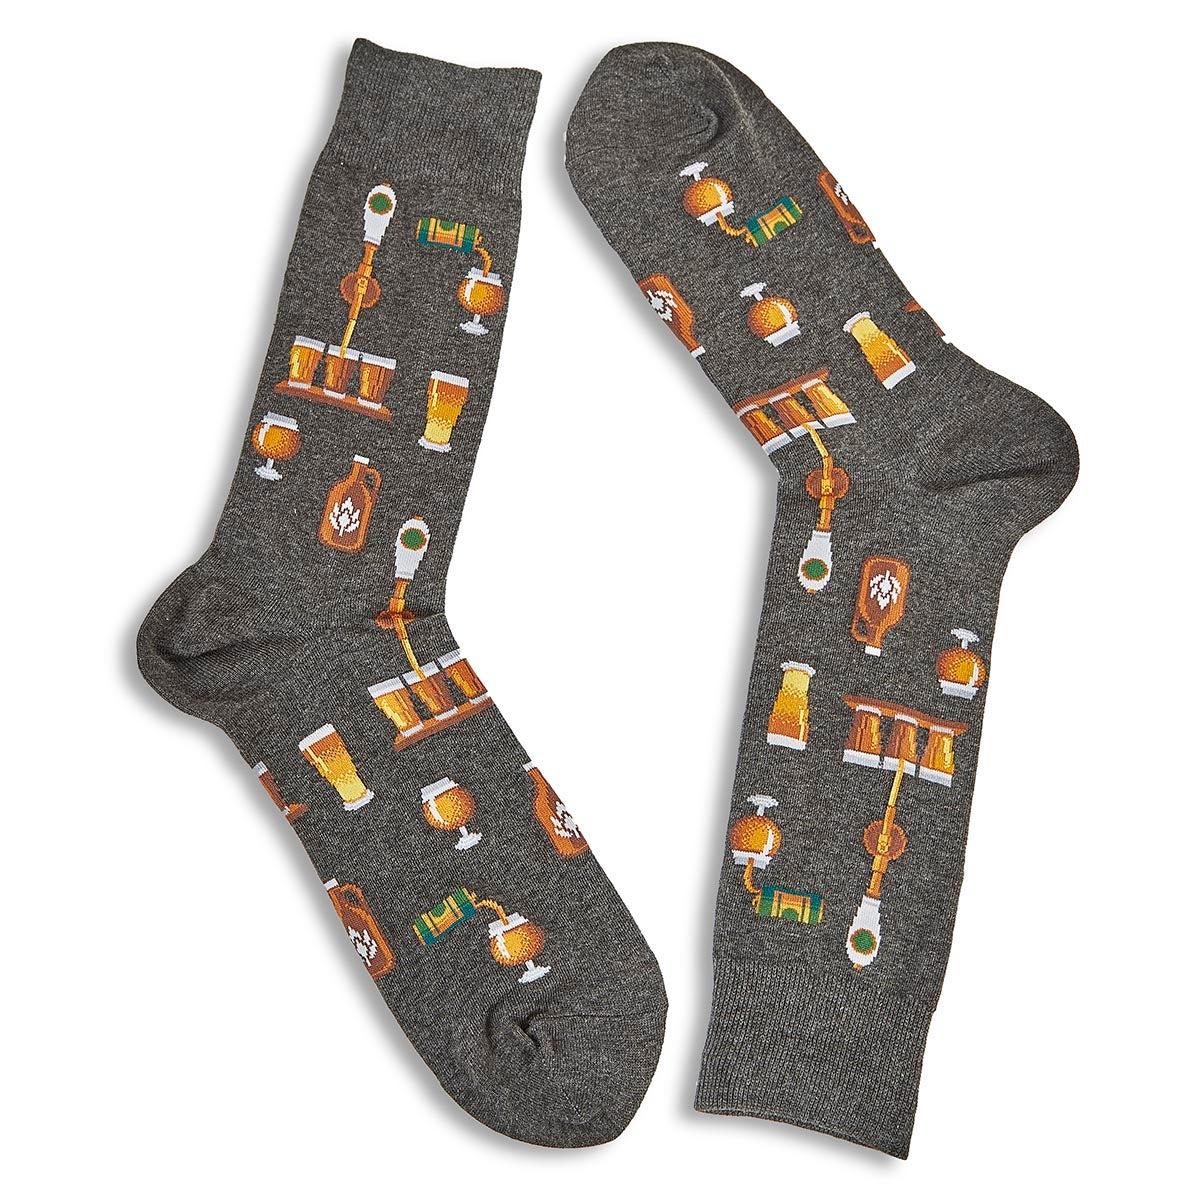 Men's Craft Beer Sock - Charcoal Printed